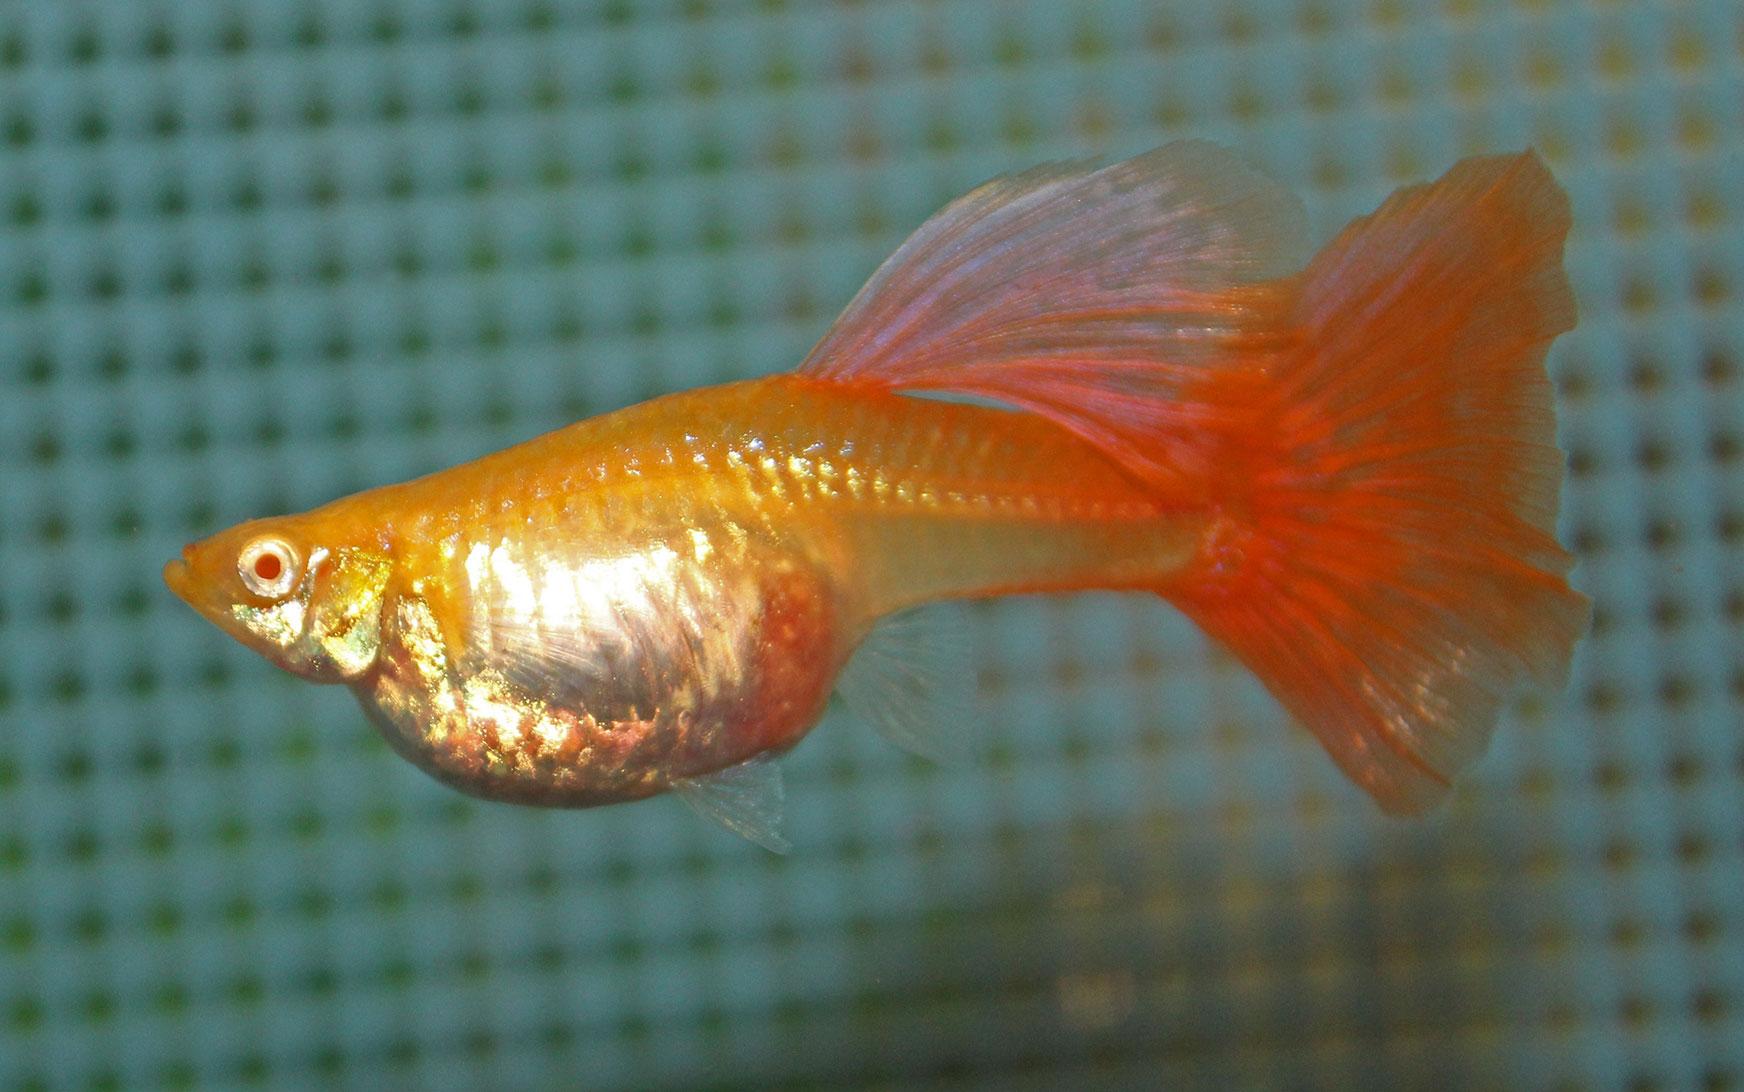 Female Guppy | A Red Albino Female Guppy Terry Aley S Guppy Site